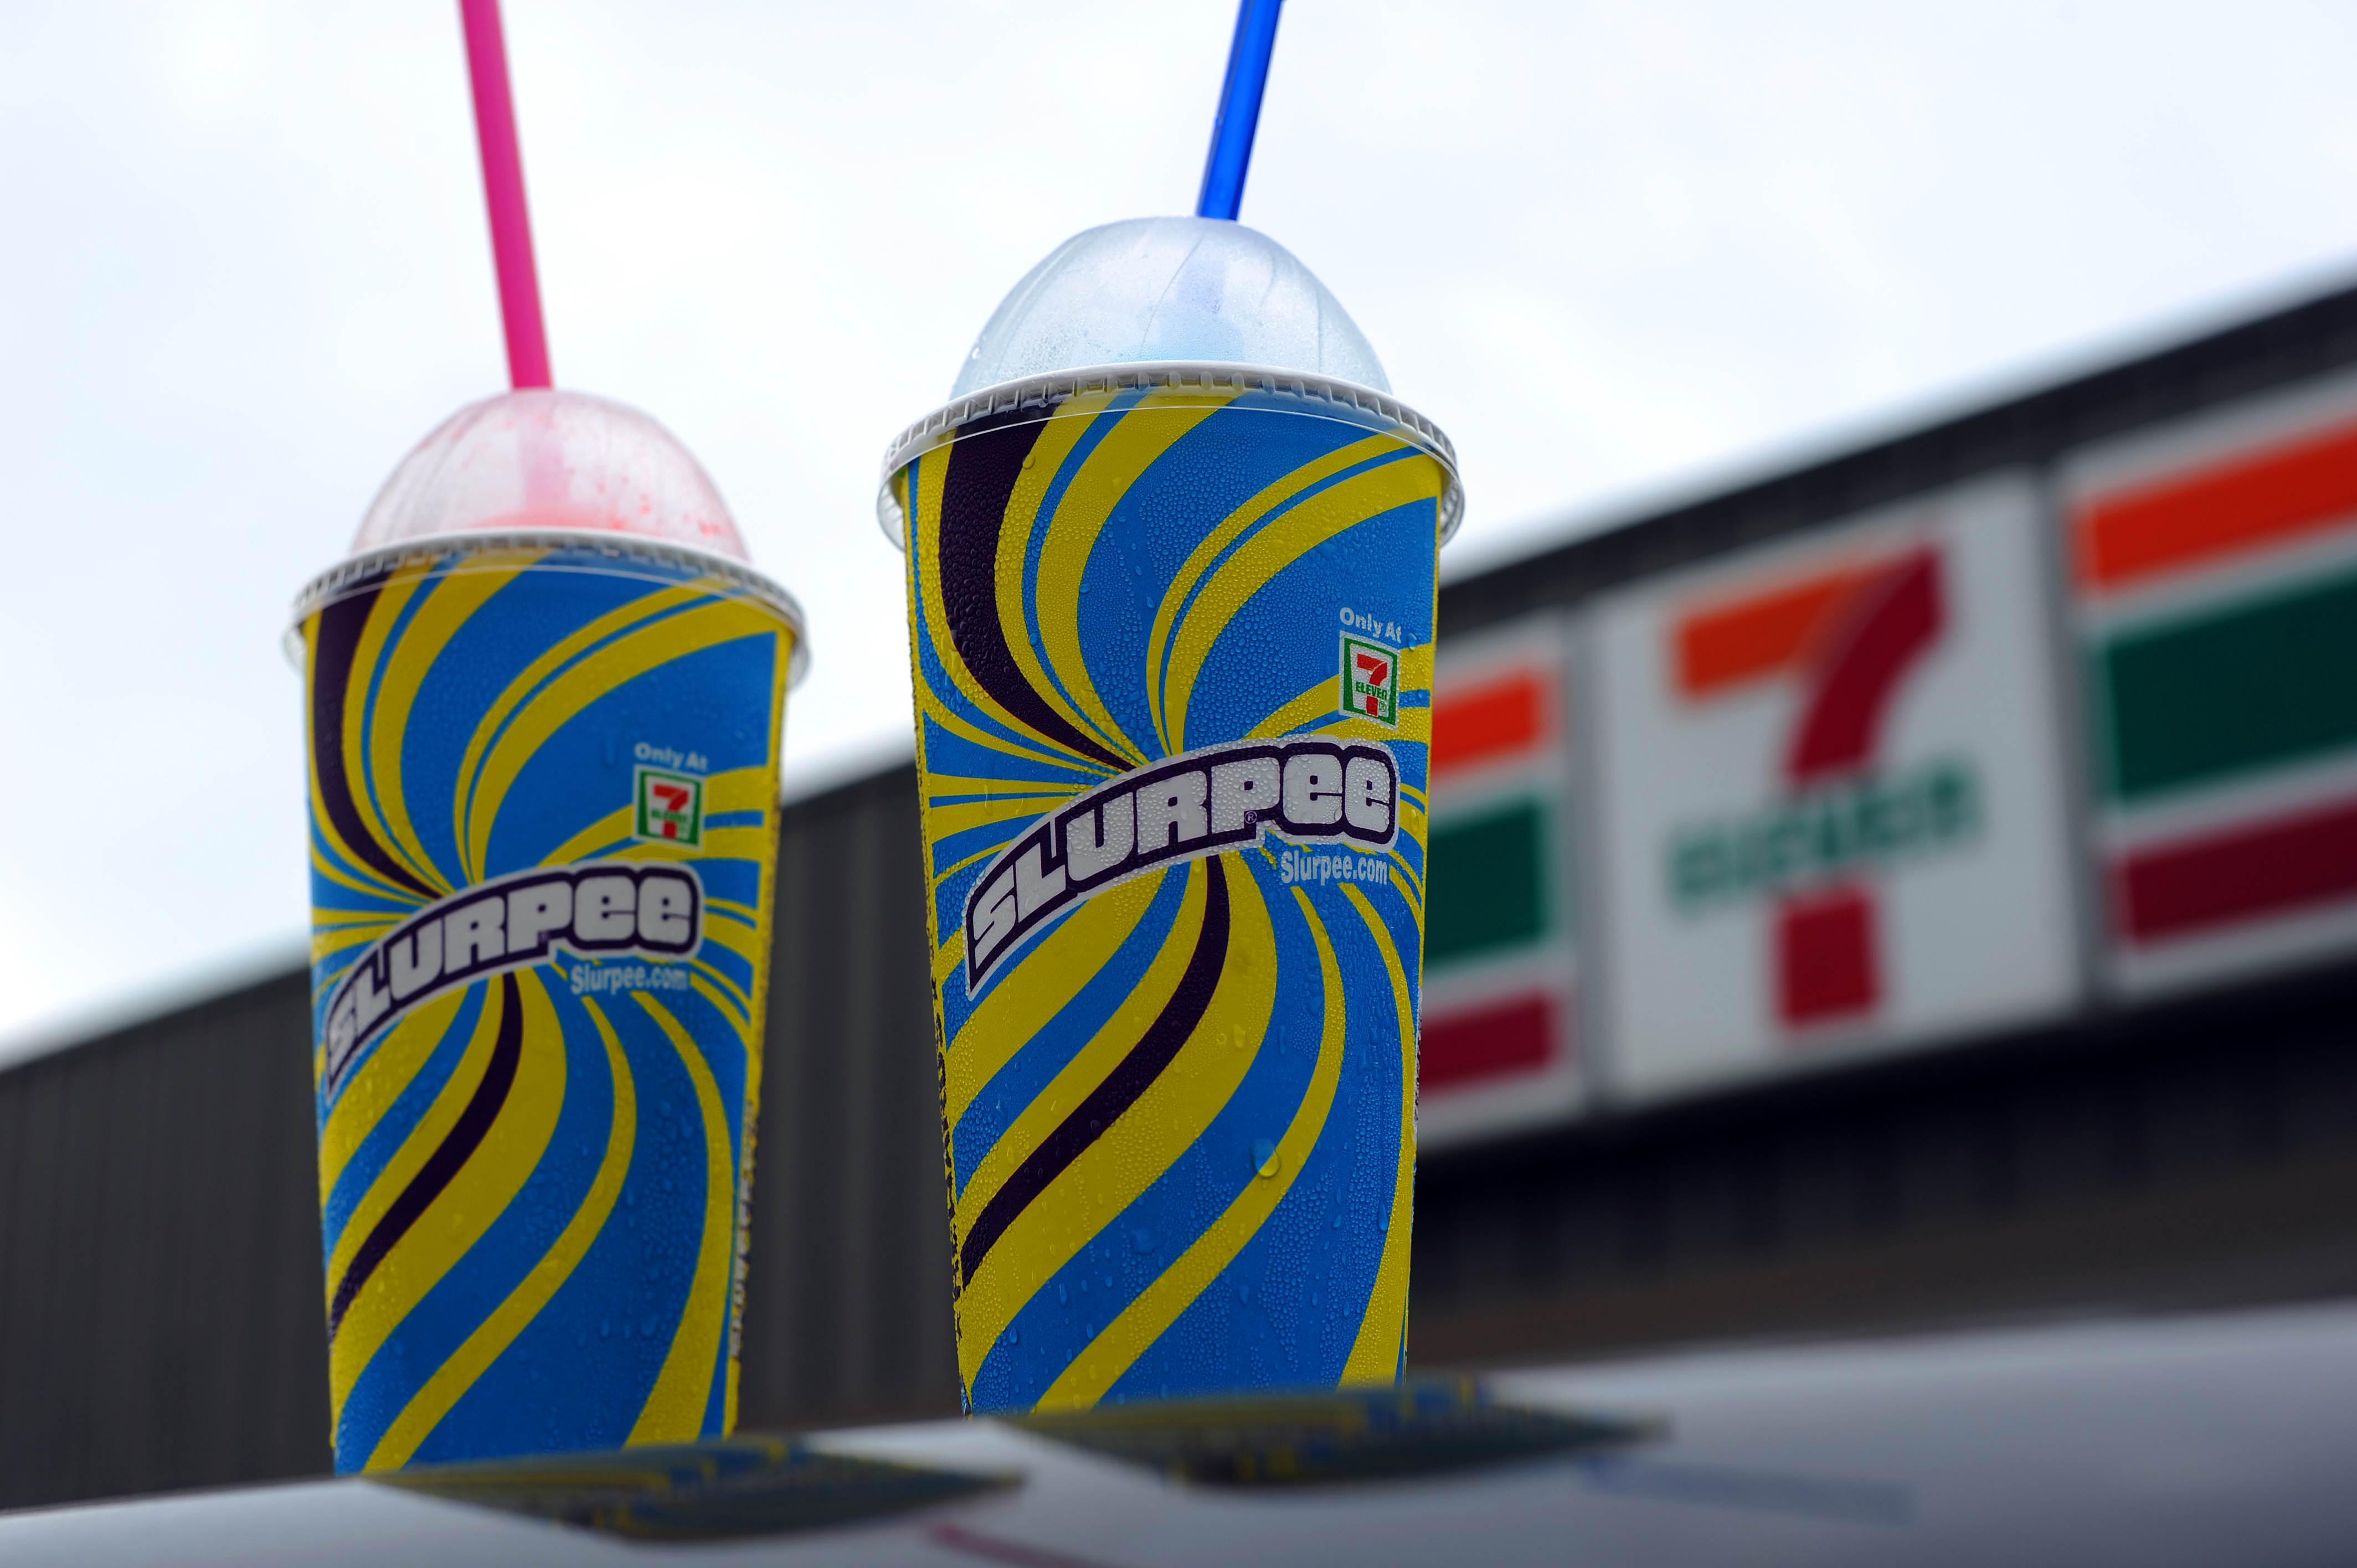 An illustration of Two, 7-Eleven Slurpee